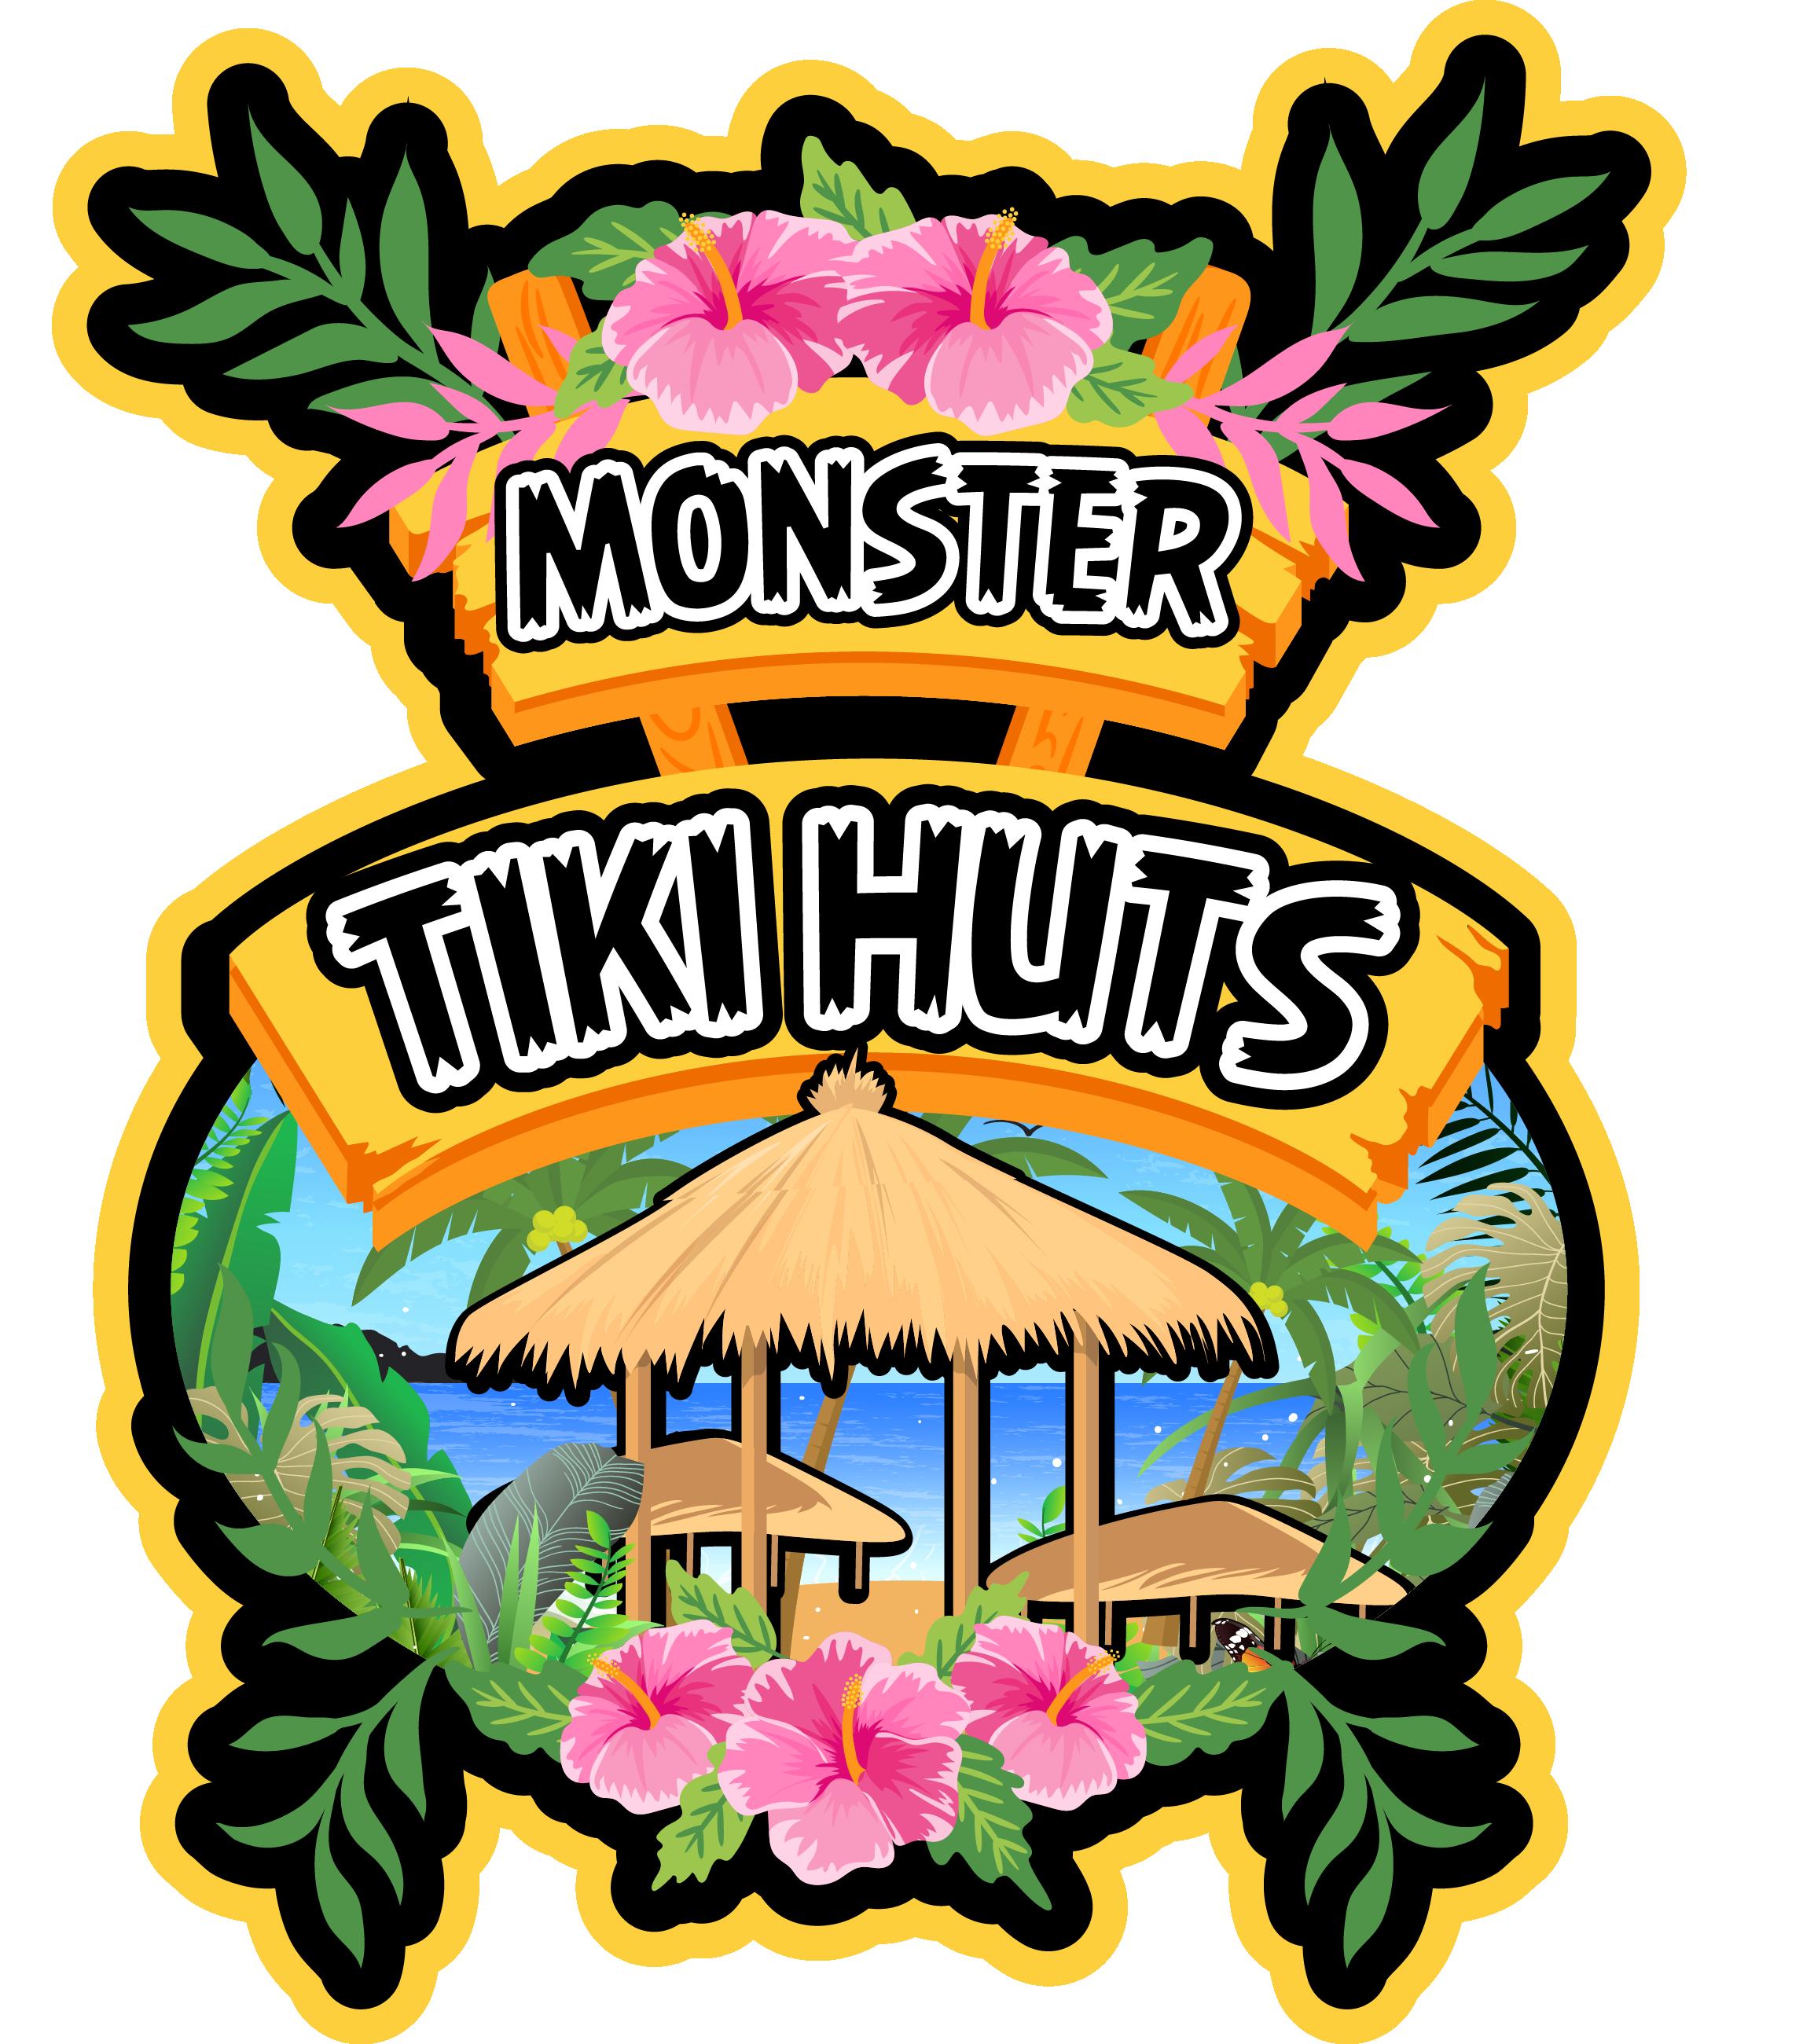 Tiki Huts Tampa Bay Licensed Insured Contractors Contact Us Tiki Hut Tiki Hut